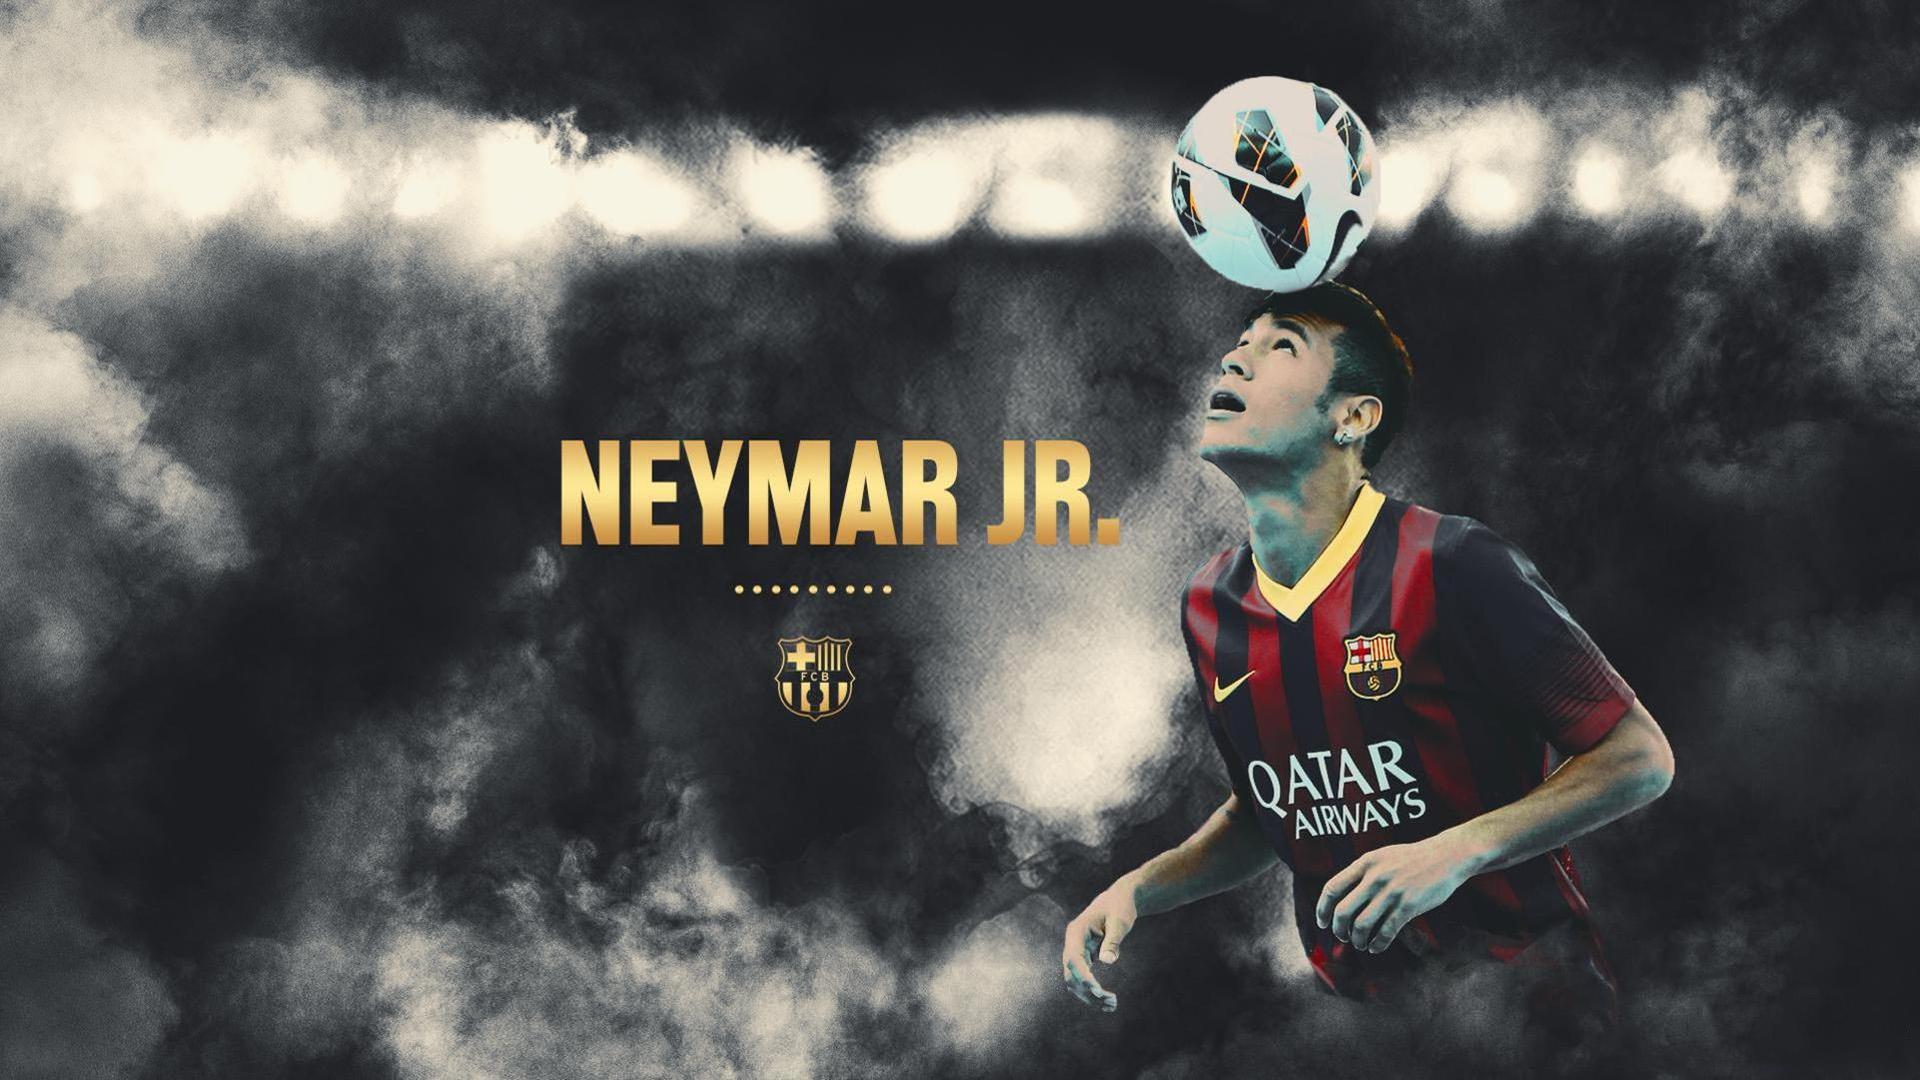 best player man image